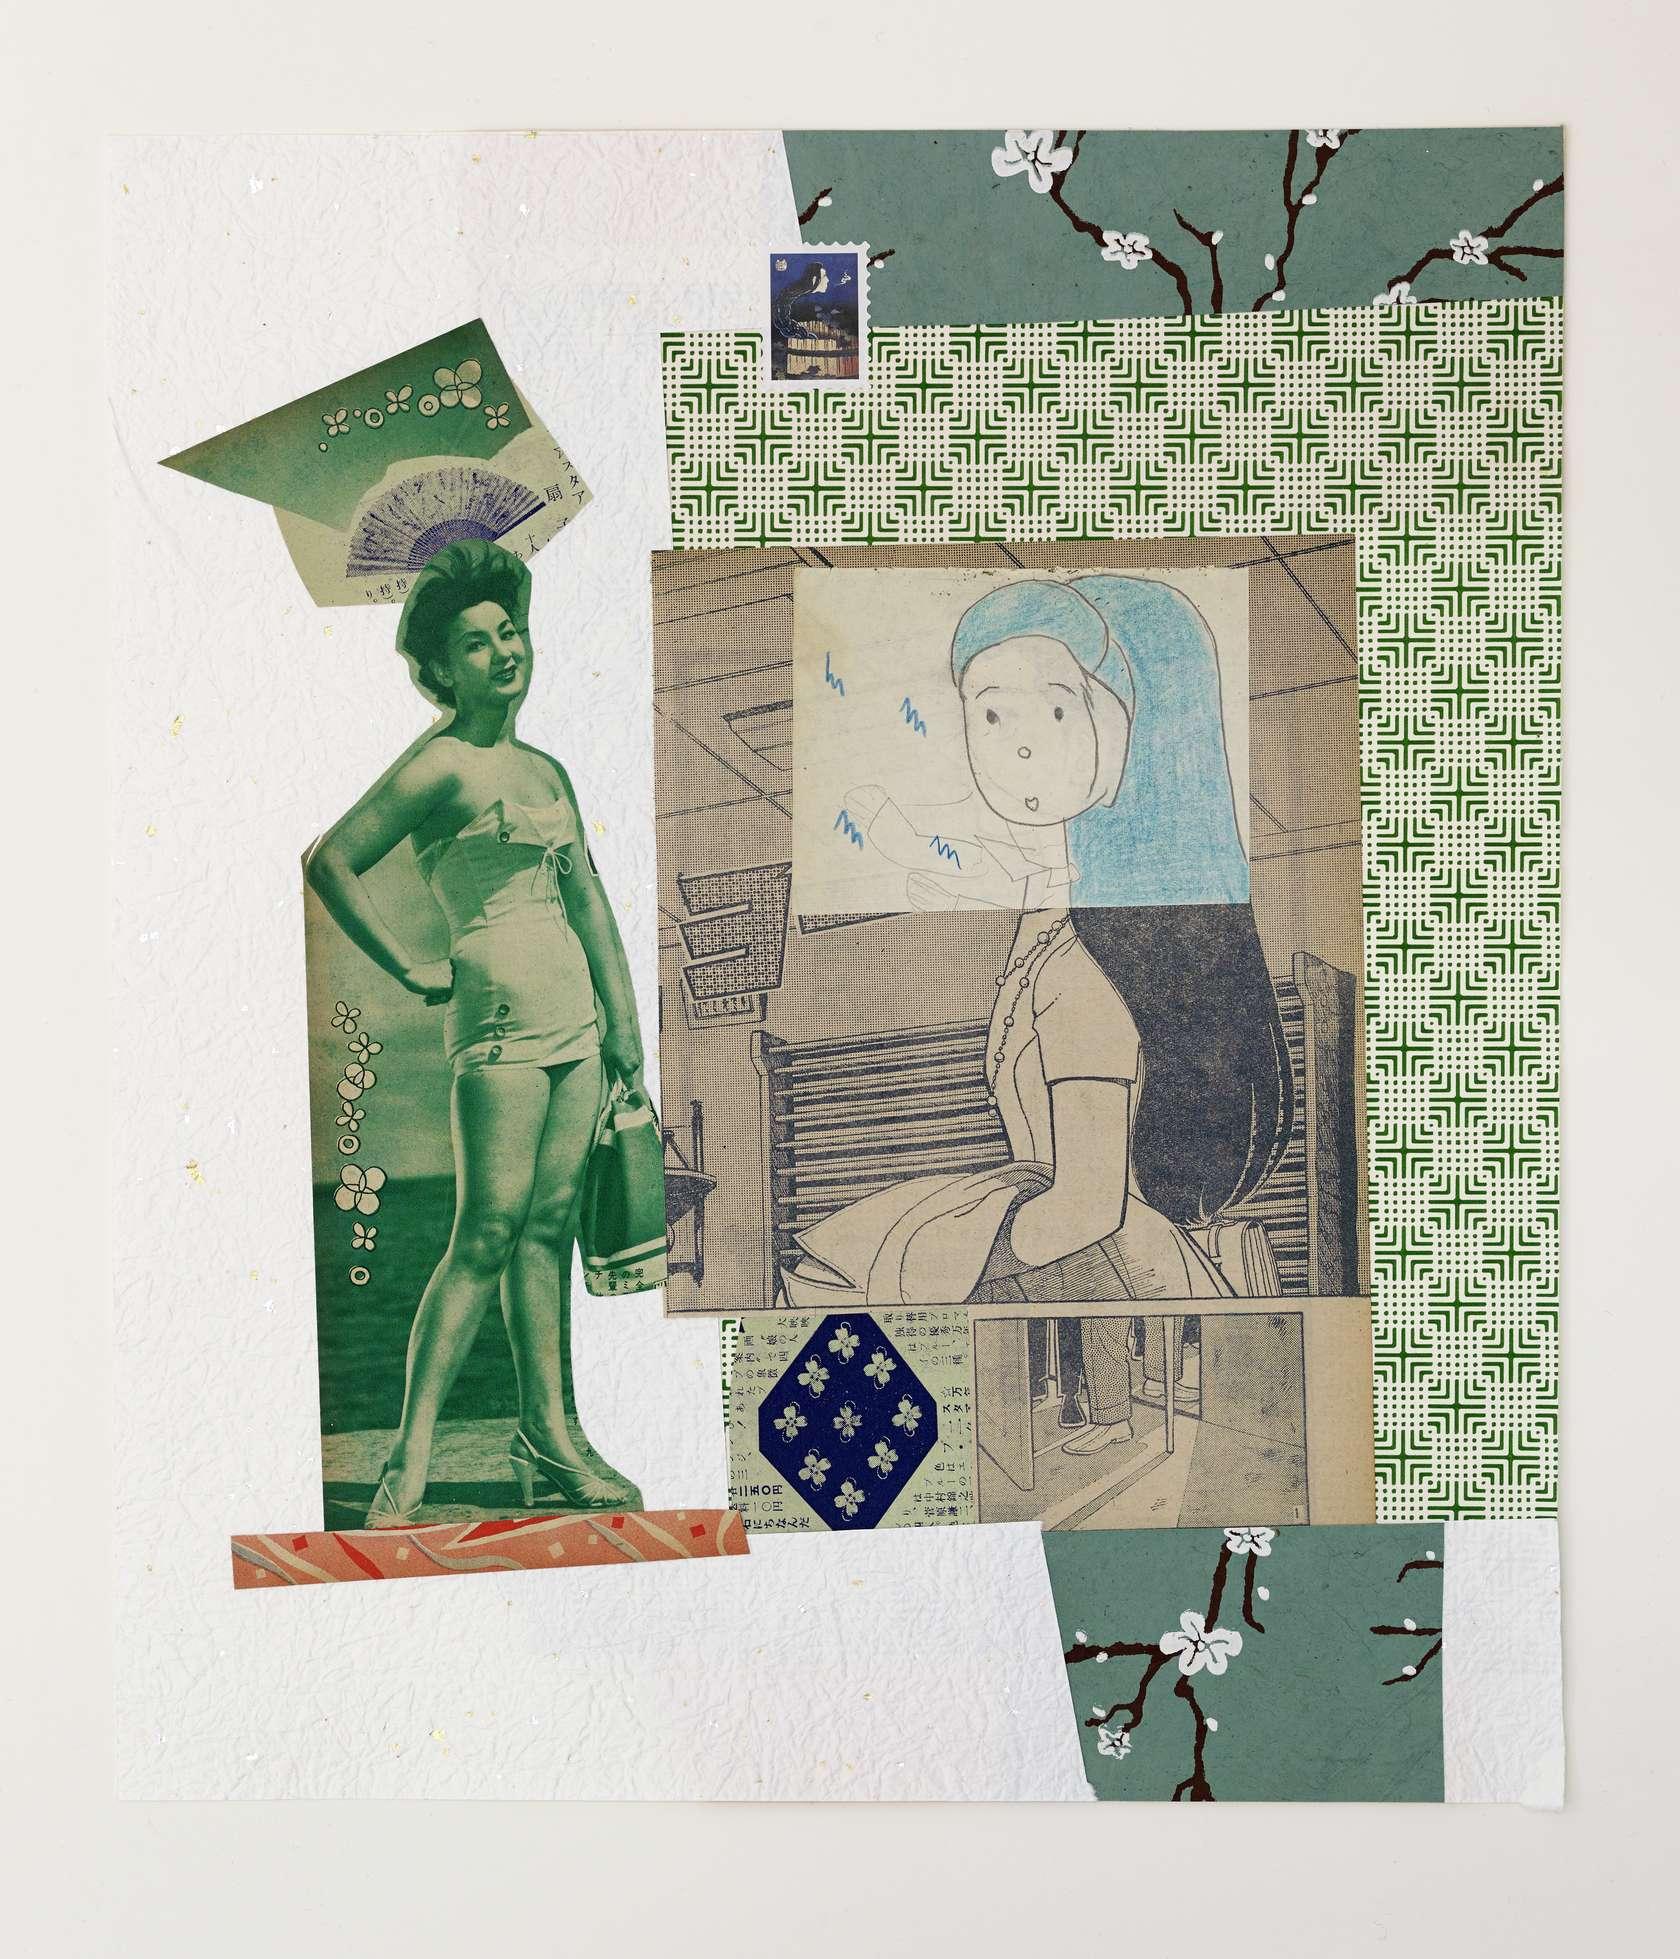 Hippolyte Hentgen, Sanjo Dori, 2019 Collage sur papier41 × 34.5 cm / 16 1/8 × 13 5/8 in.